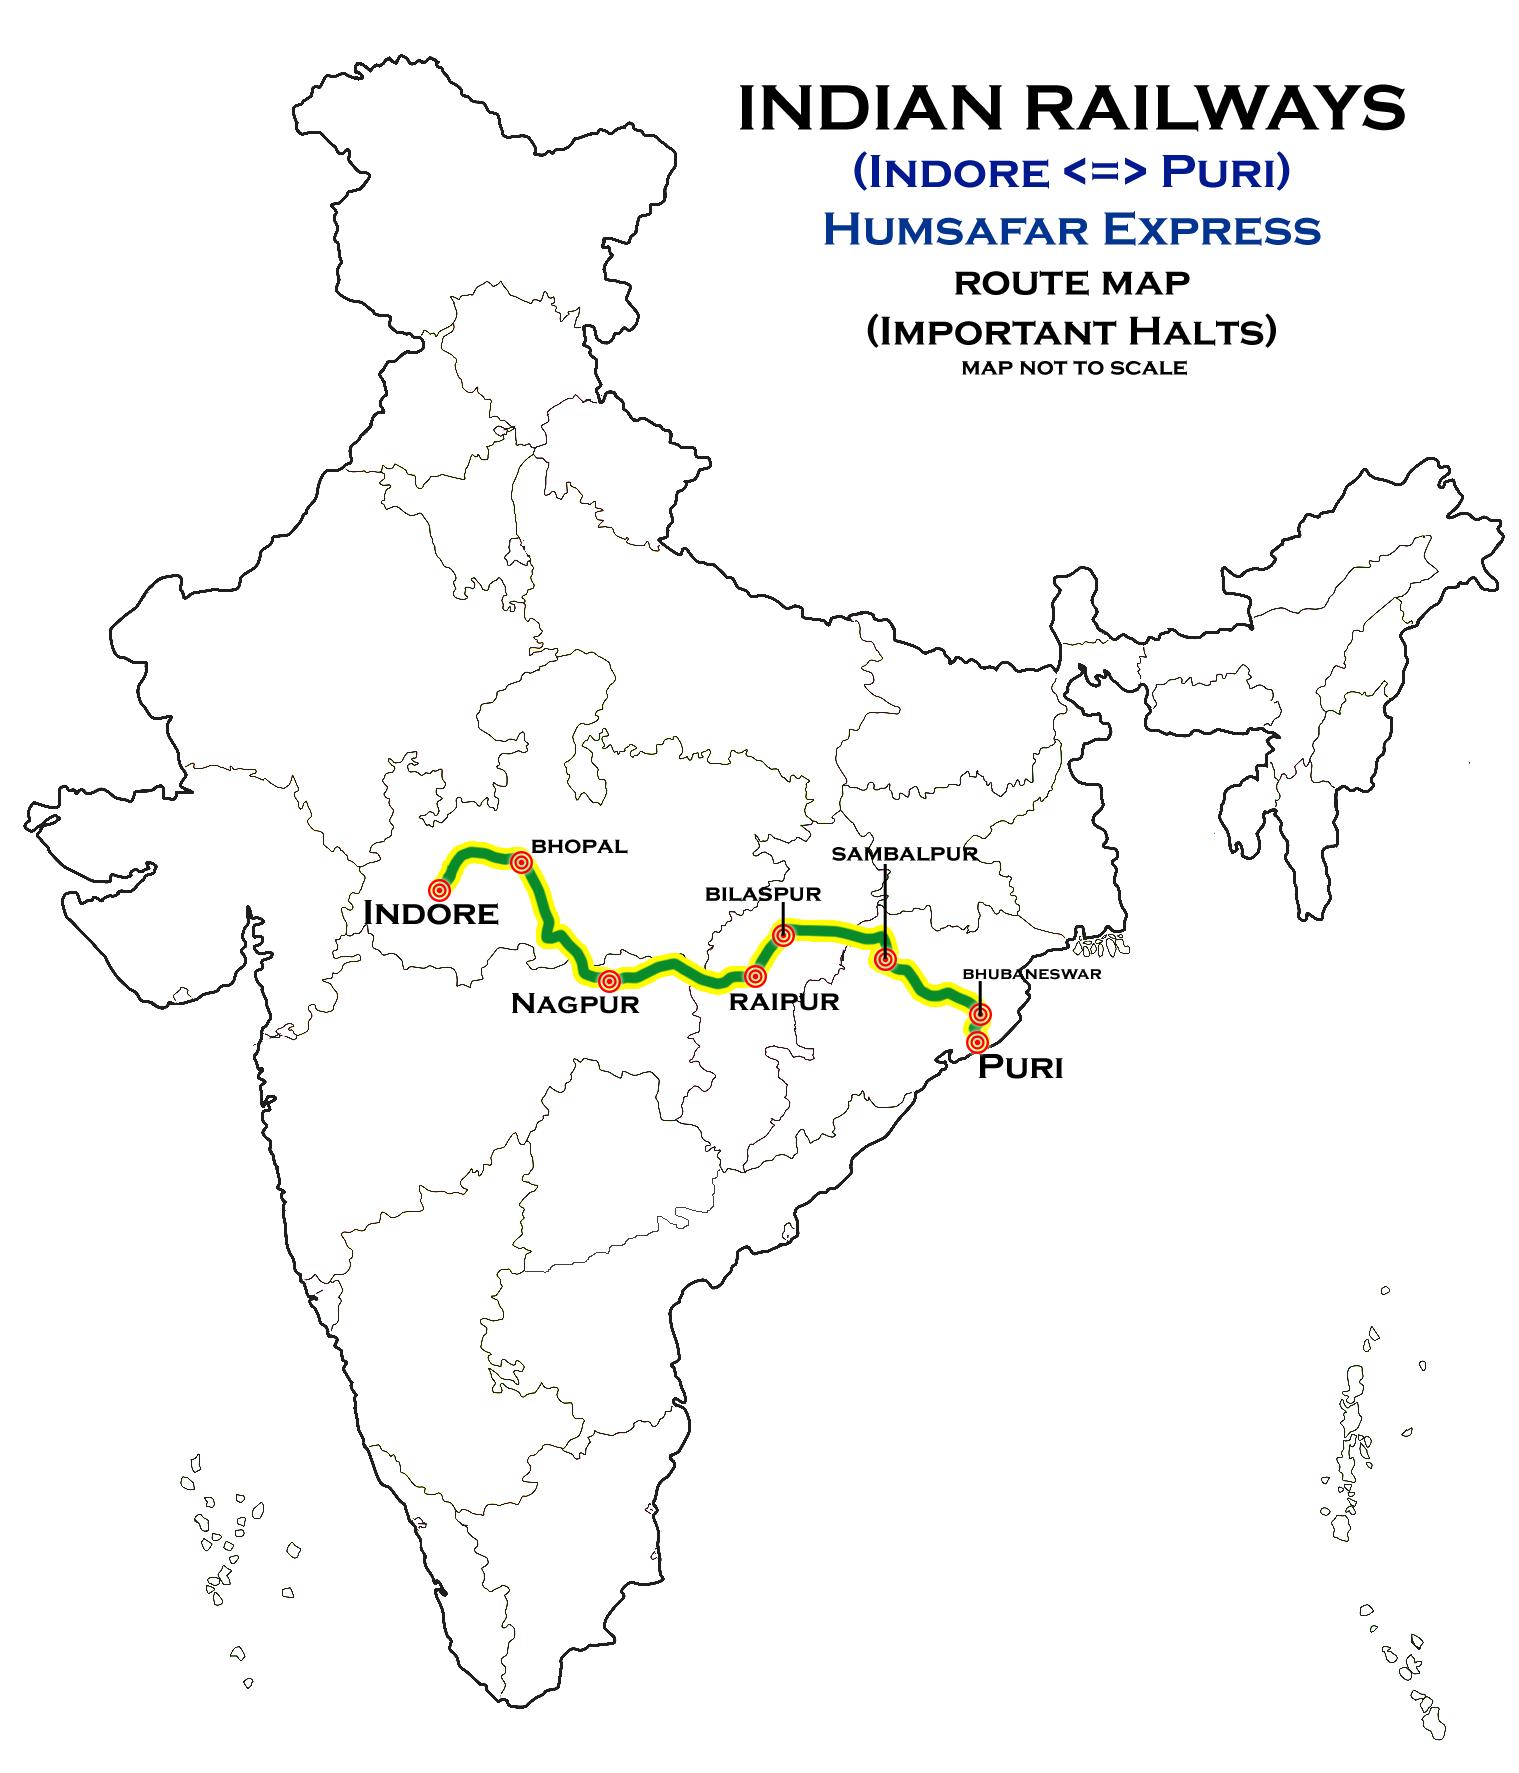 Indore - Puri Humsafar Express - Wikipedia